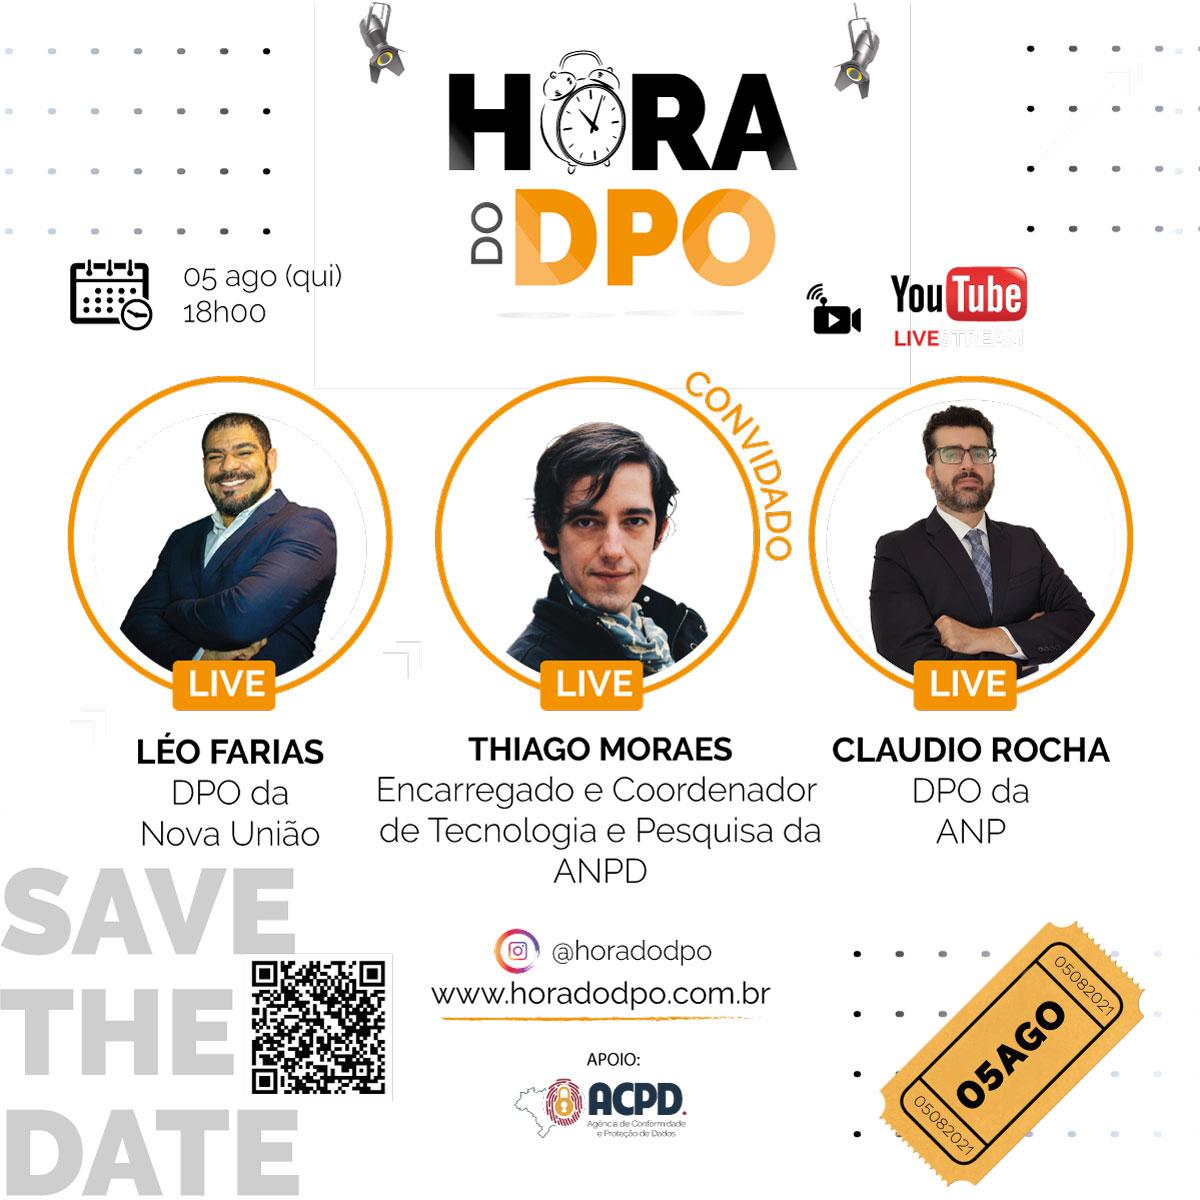 Episódio 12, Thiago Moraes